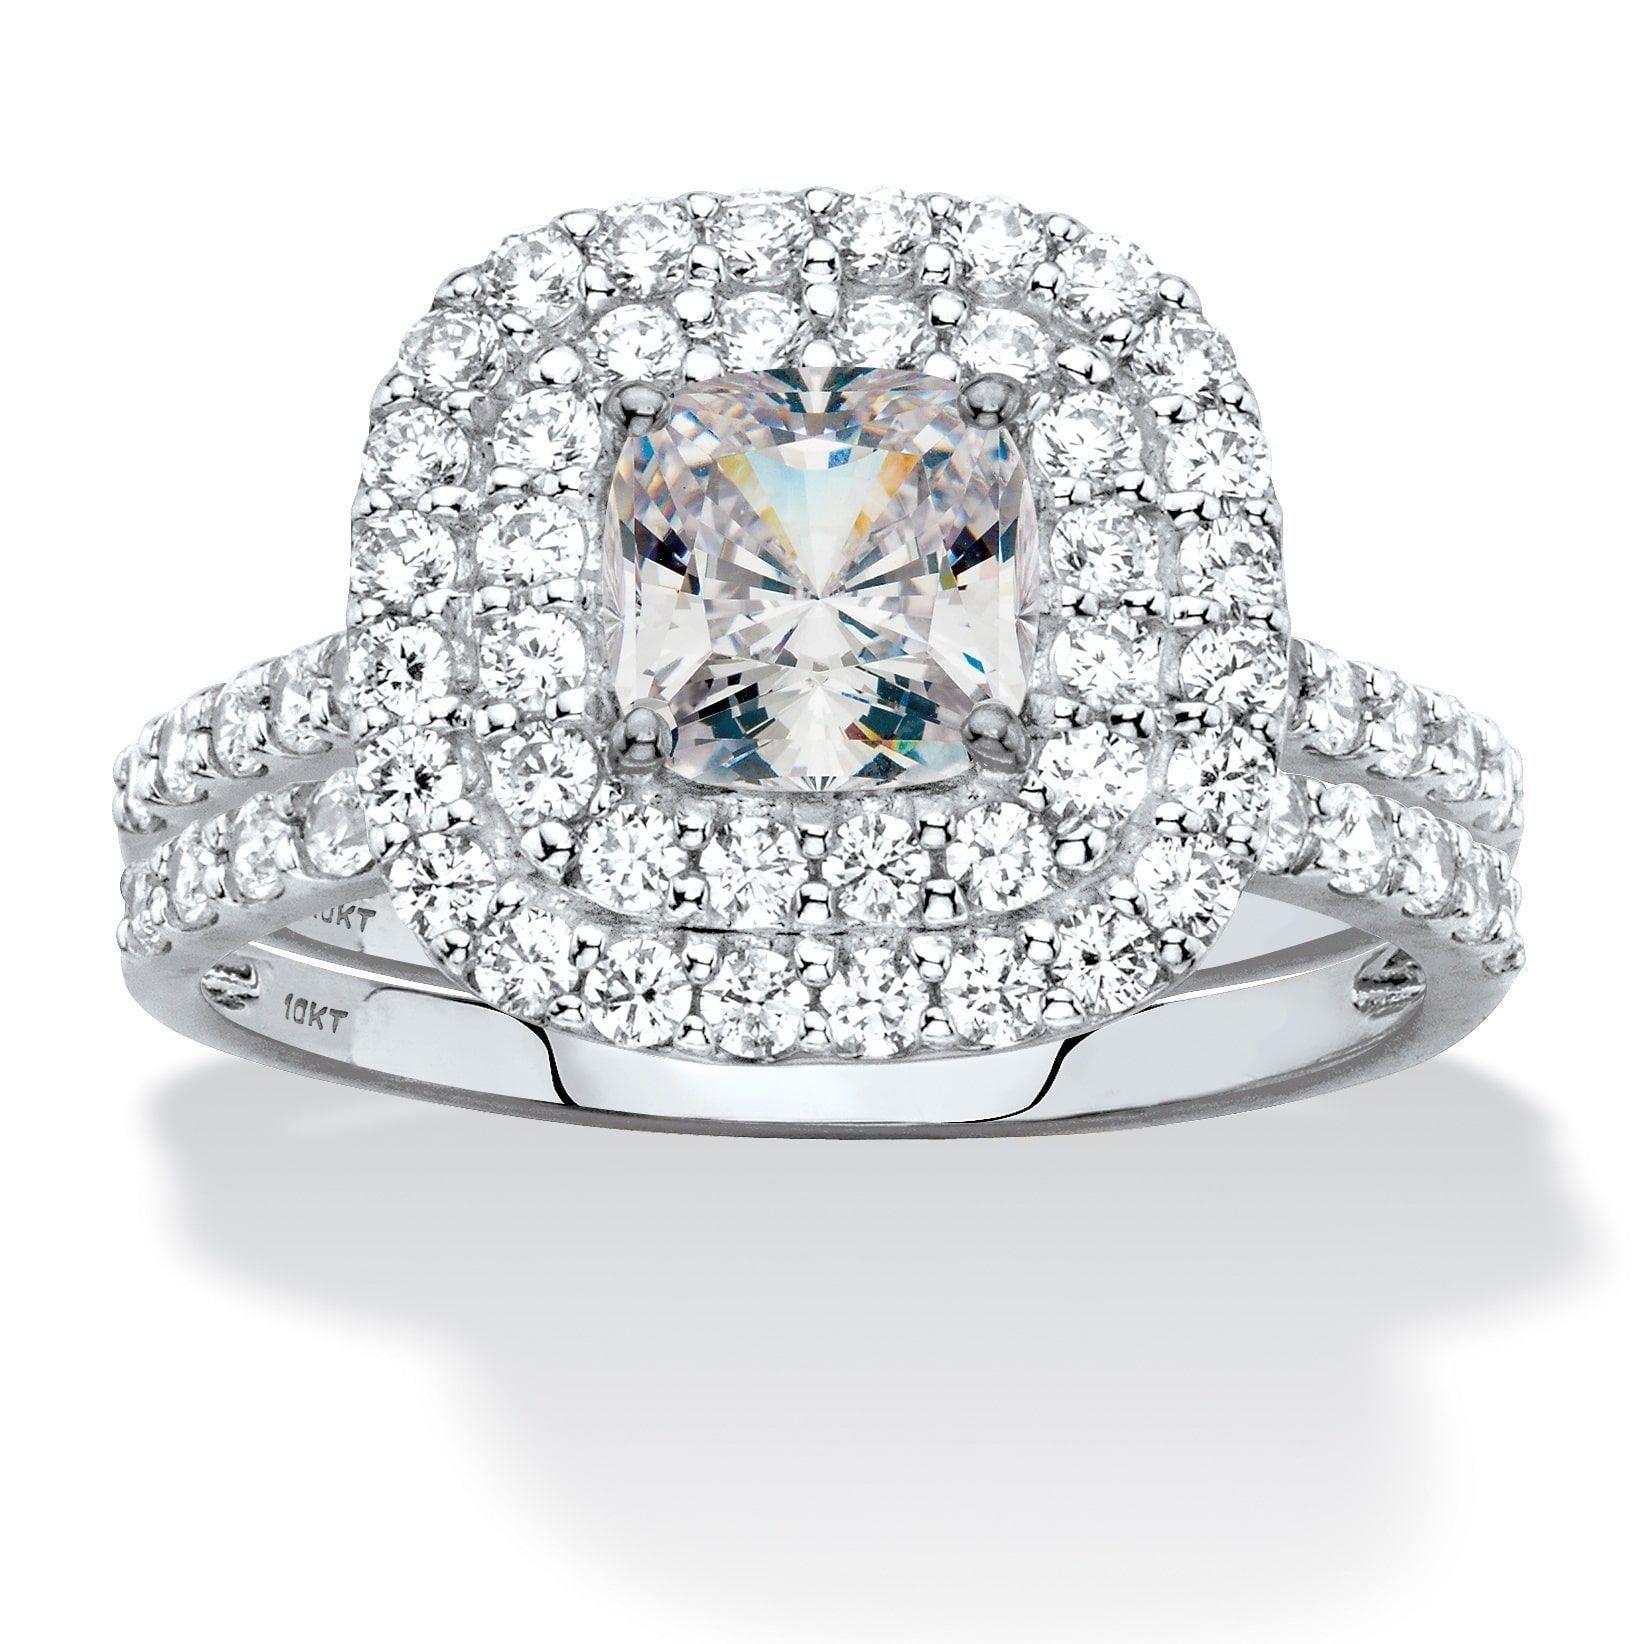 10K White Gold Cubic Zirconia Bridal Ring Set Wedding